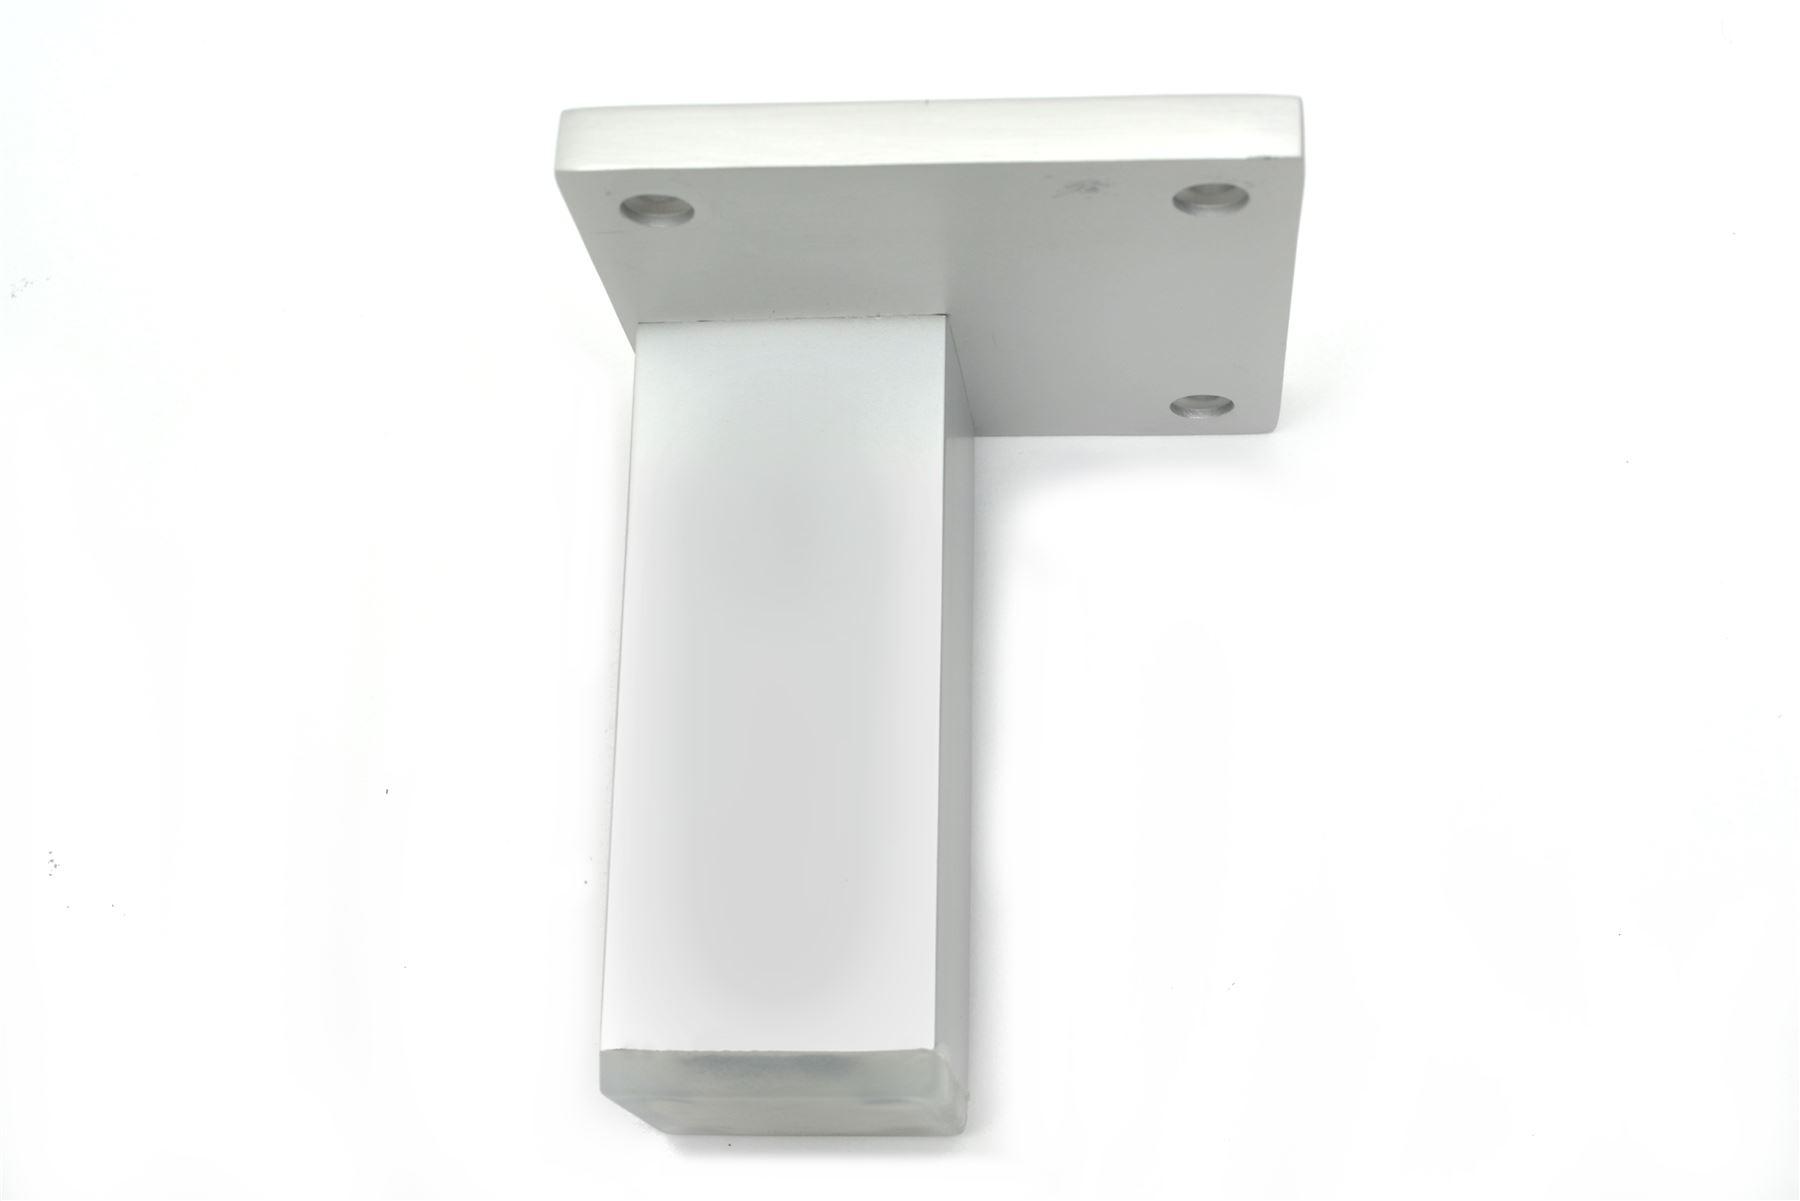 aluminium f e beine schr nke k che m bel chrom 70mm 200mm ebay. Black Bedroom Furniture Sets. Home Design Ideas